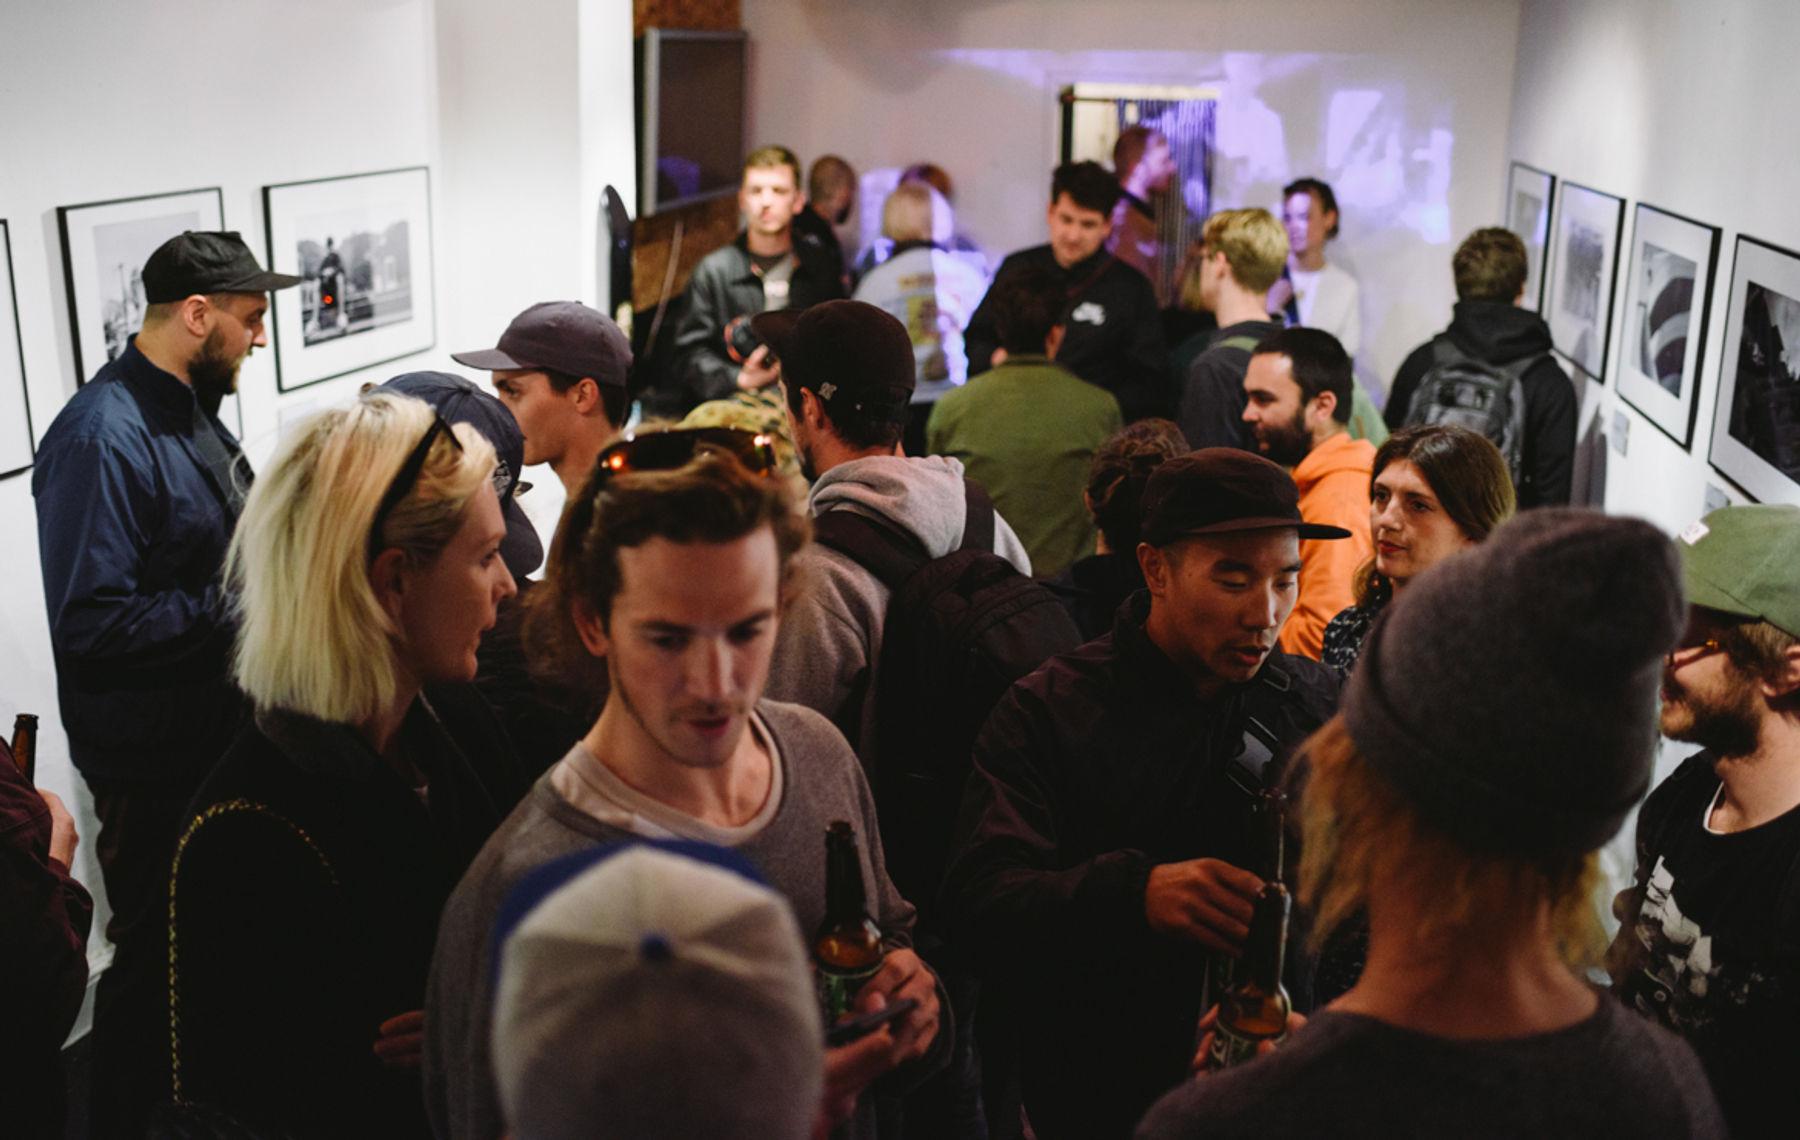 _IHC3958e-Carl-Richardson-Manny-Lopez-DC-Special-Delivery-Skate-Tour-BTS-Parlour-Defy-Convention-Exhibition-London-May-2015-Photographer-Maksim-Kalanep